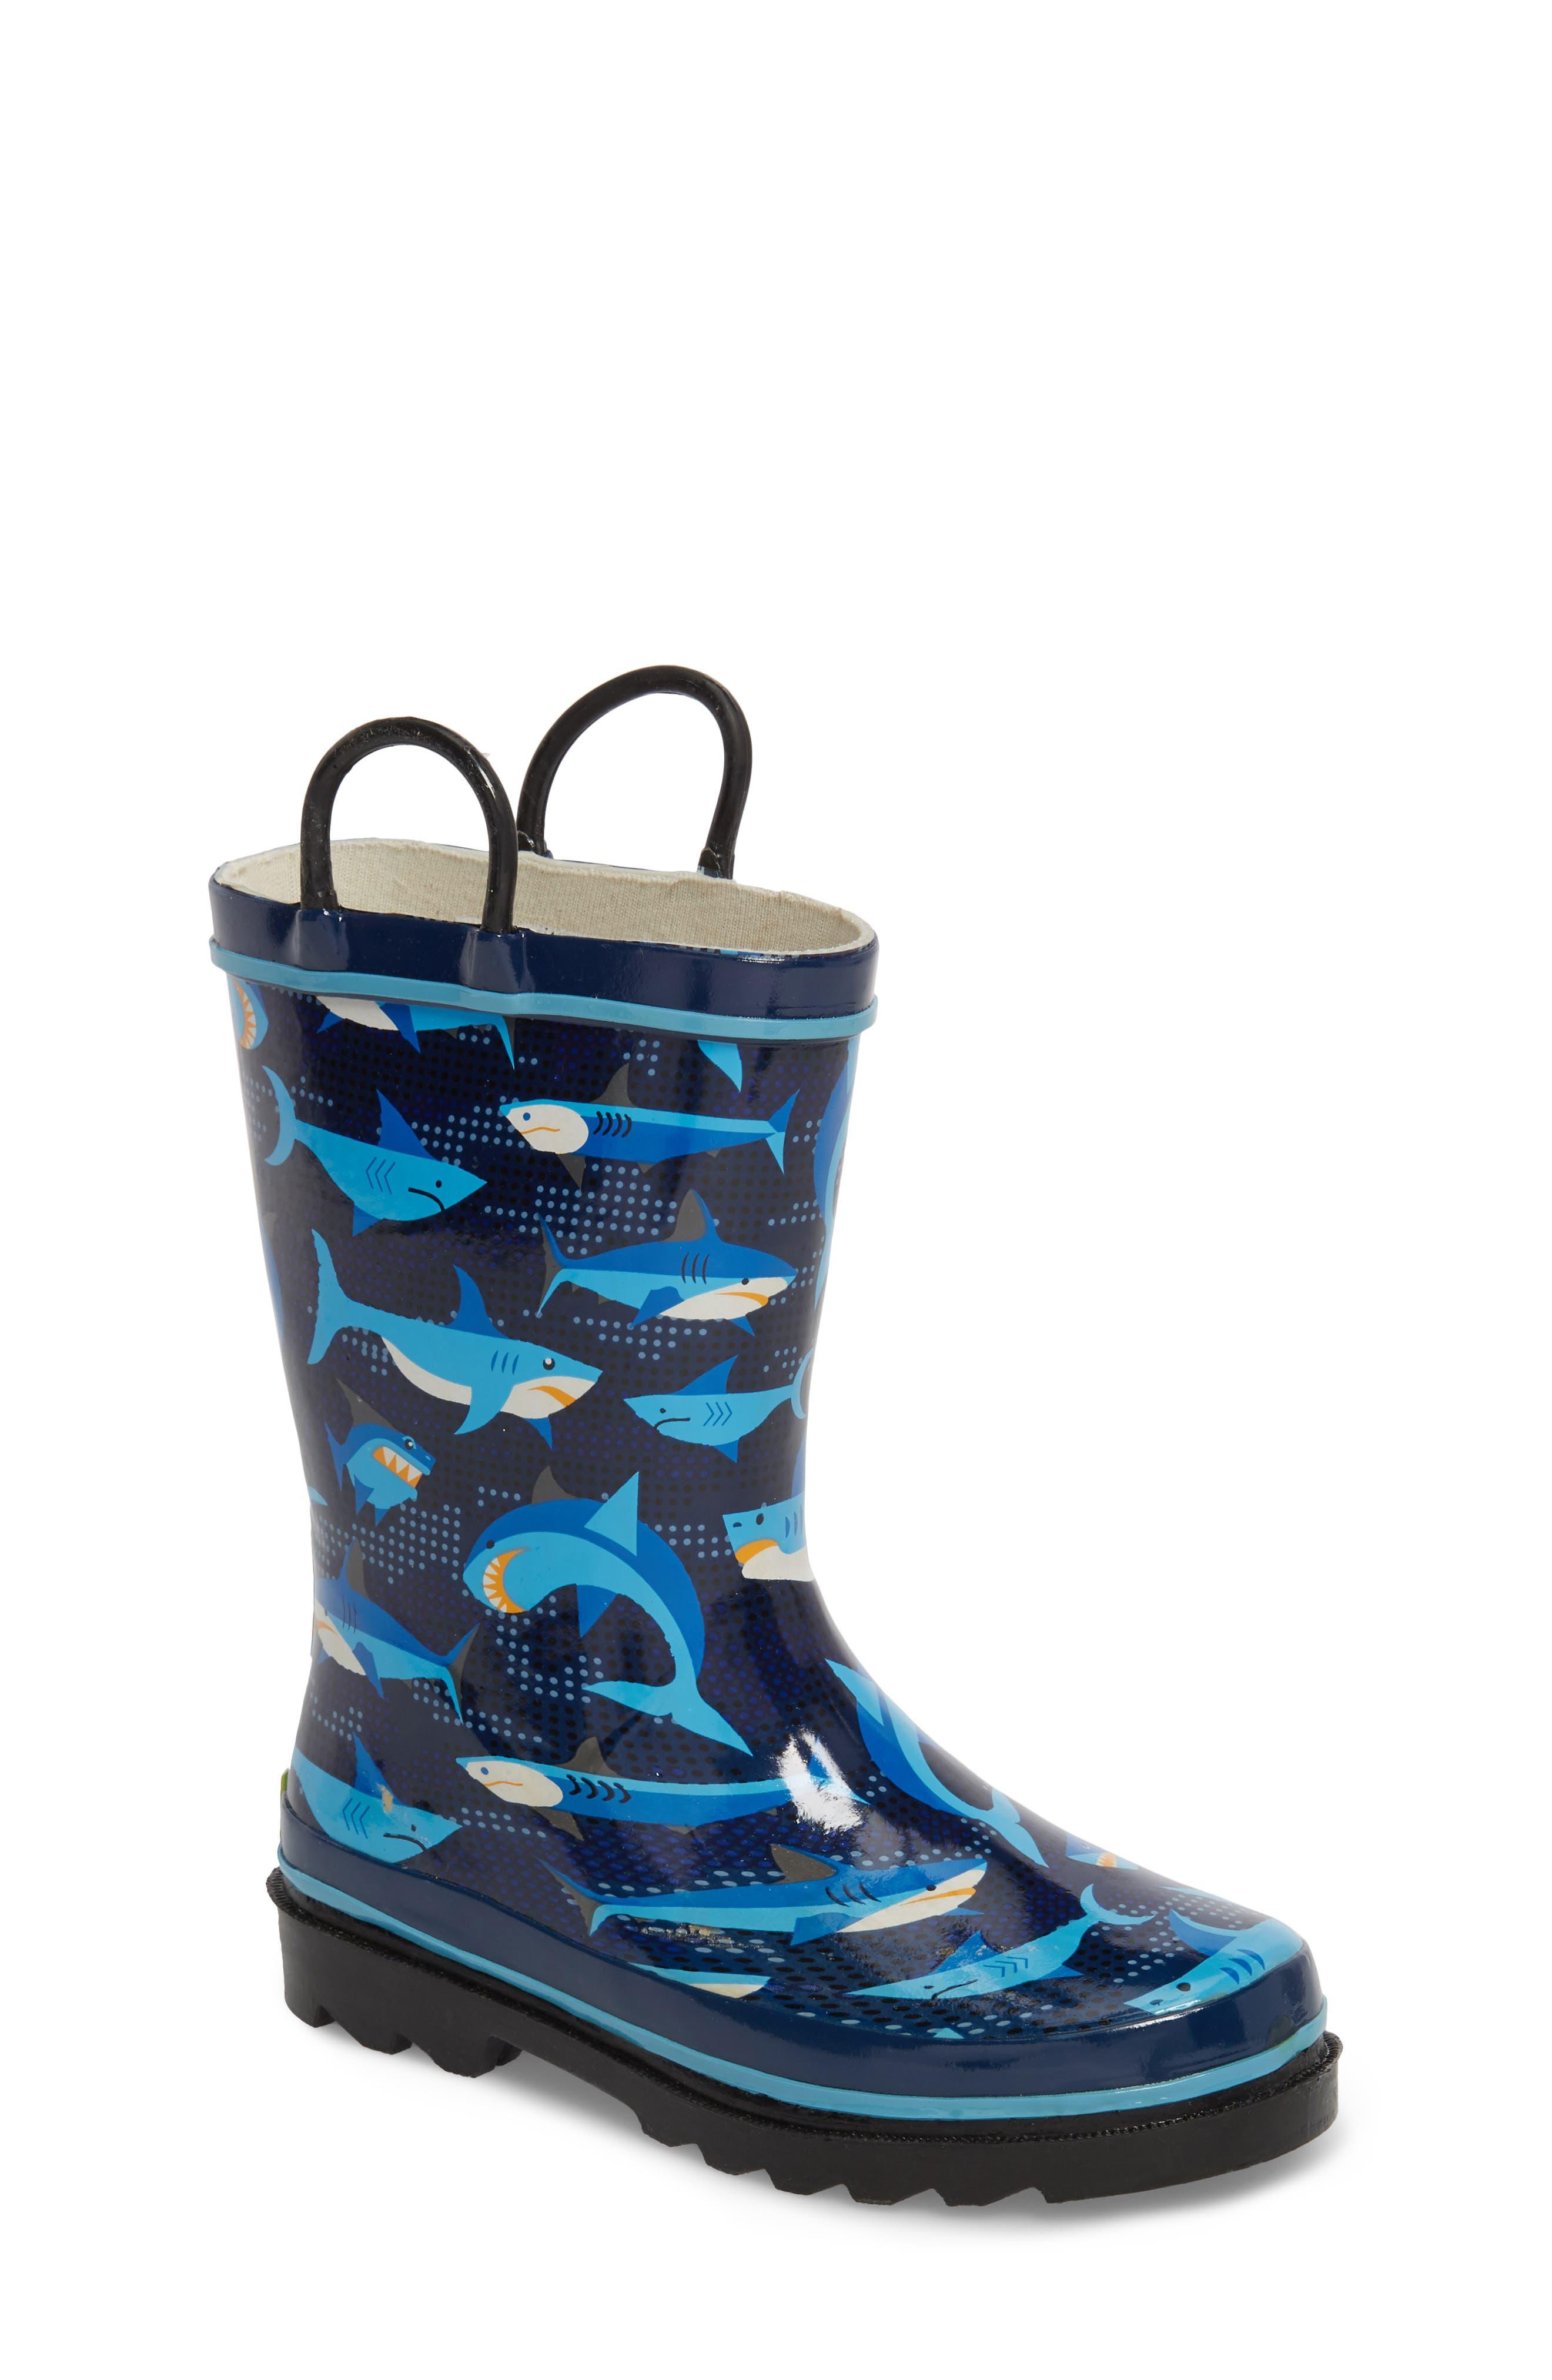 Pixel Shark Camo Rain Boot,                             Main thumbnail 1, color,                             NAVY